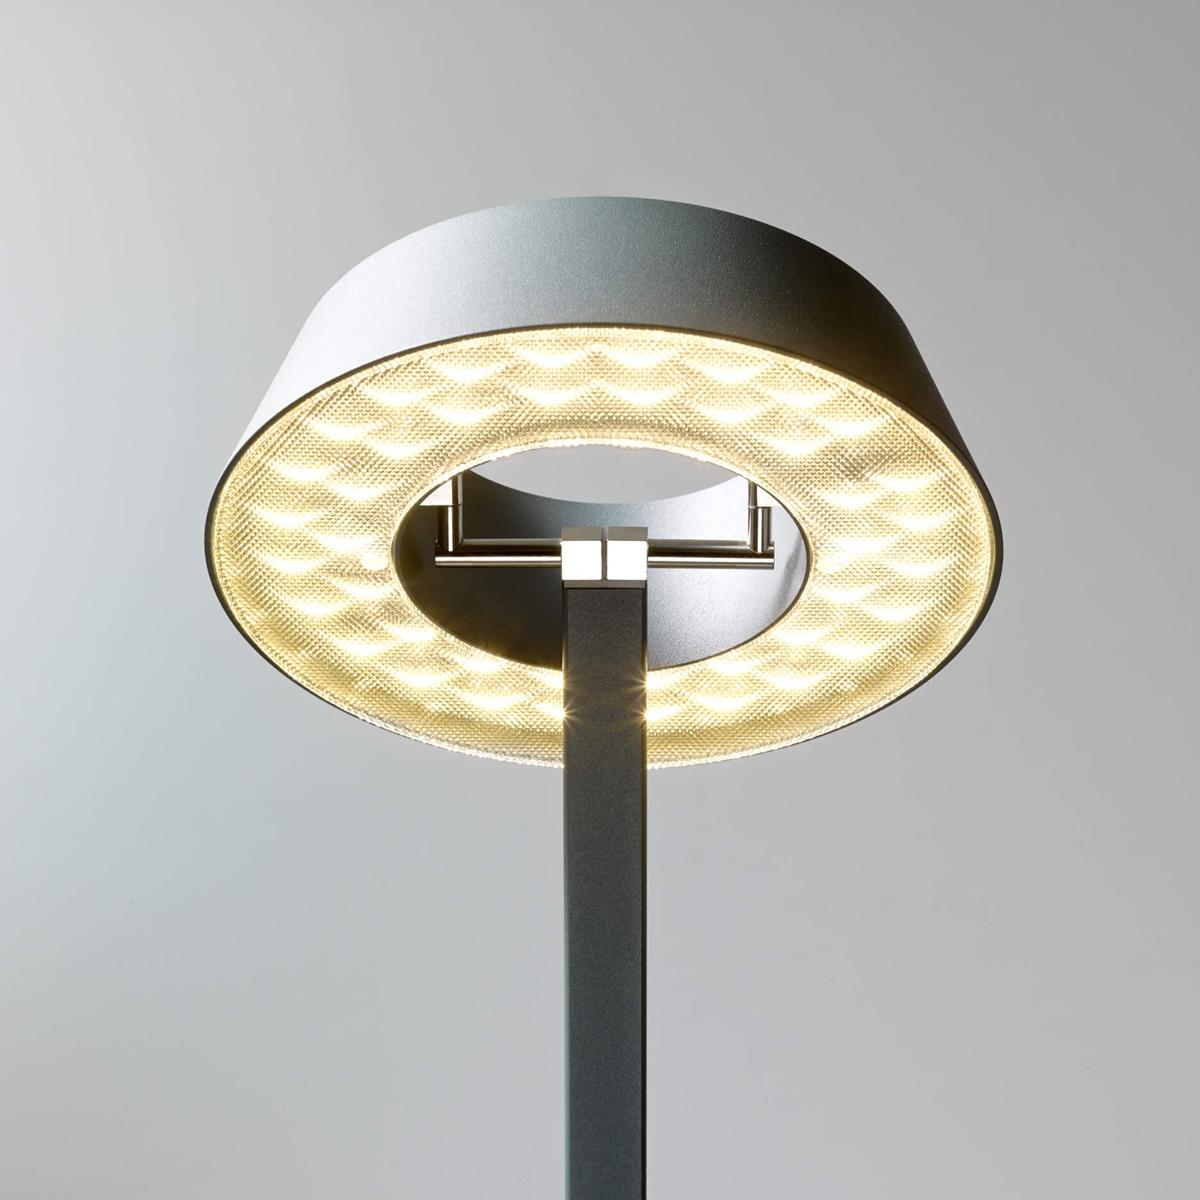 Oligo OLIGOplus Glance LED Tischleuchte